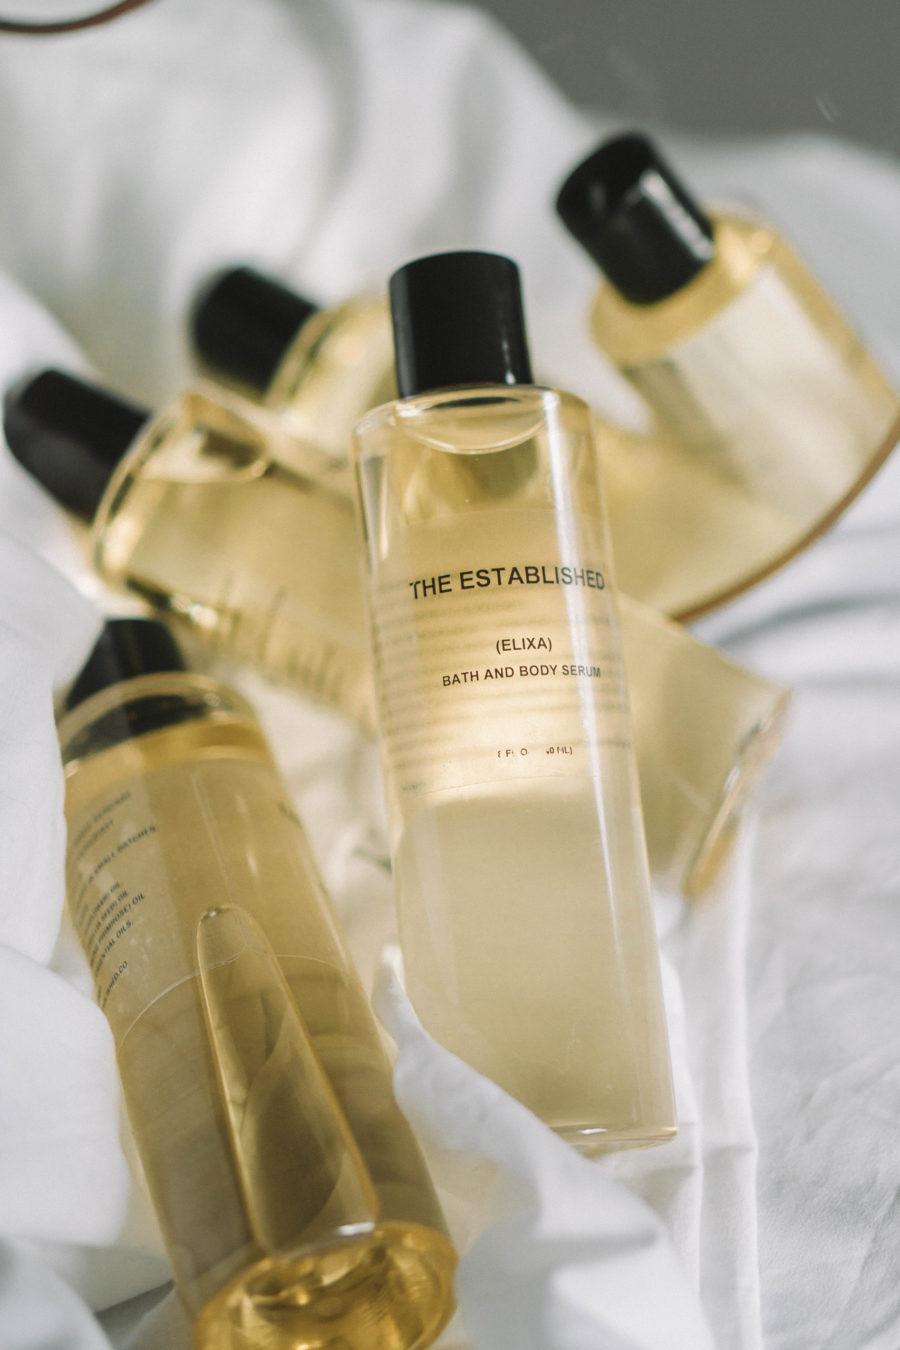 The Established Elixa Bath and Body Serum bottles